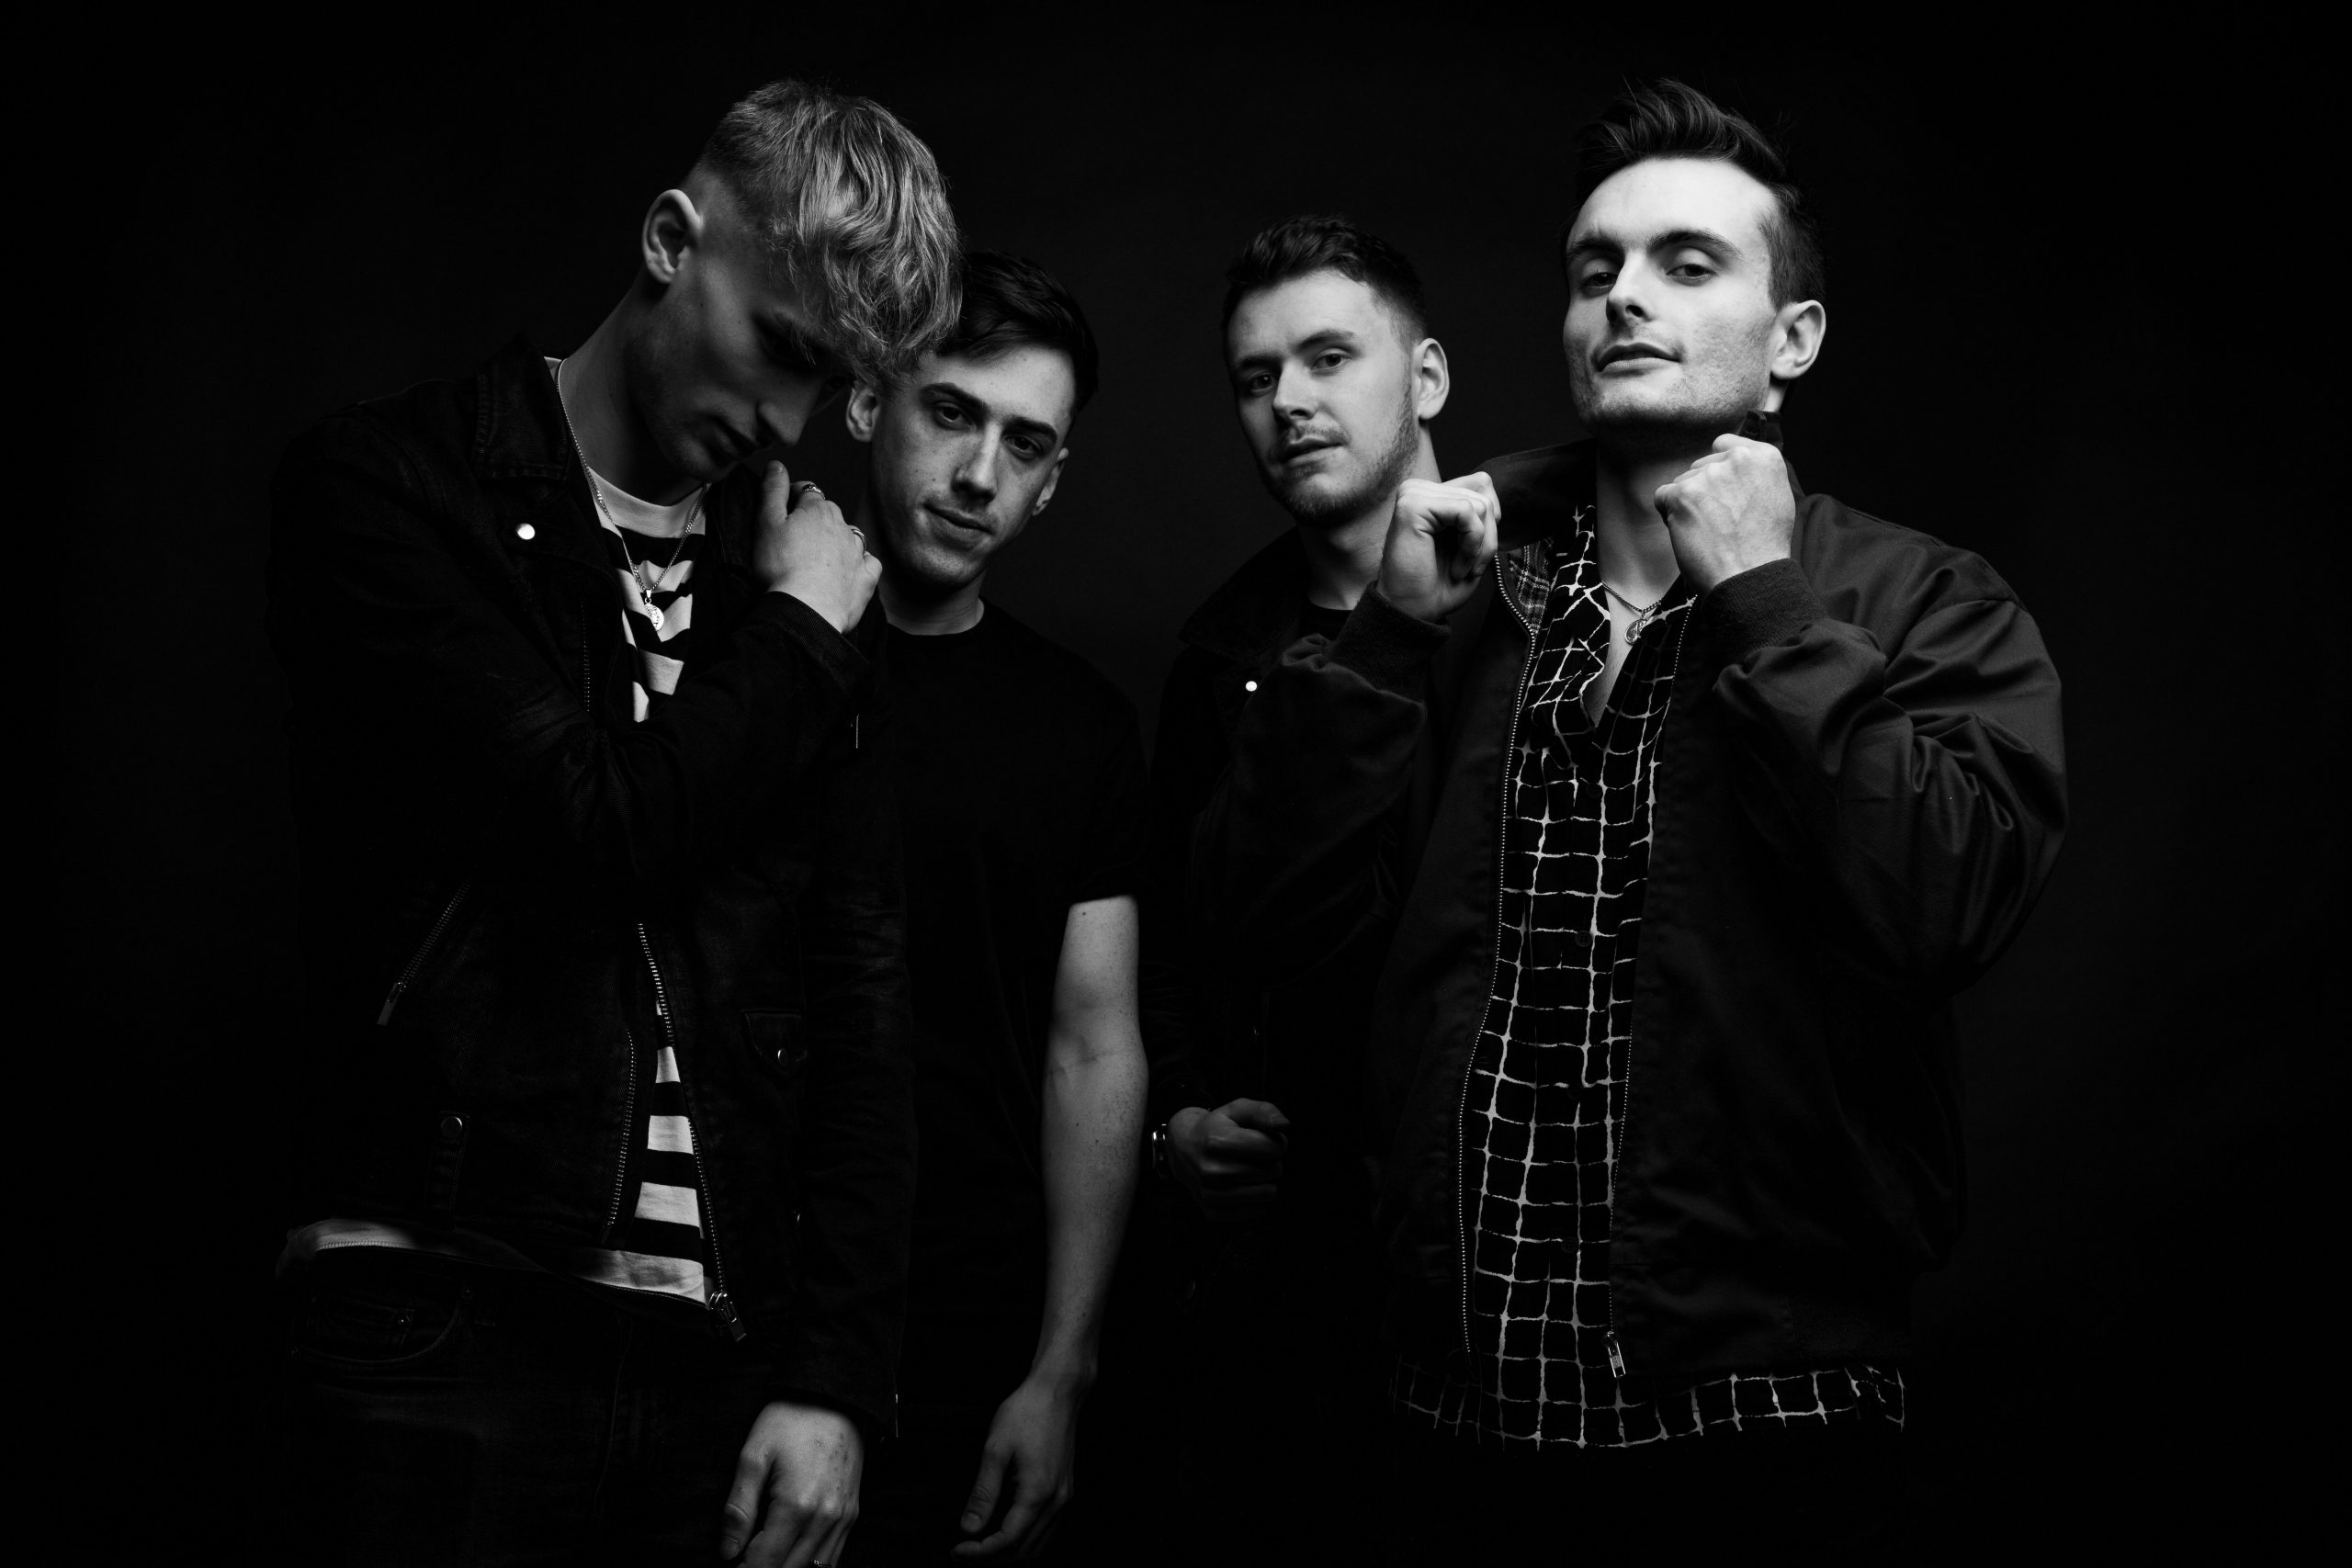 NEPTUNE VALLEY announce release of brand new single 'Dark Embrace'